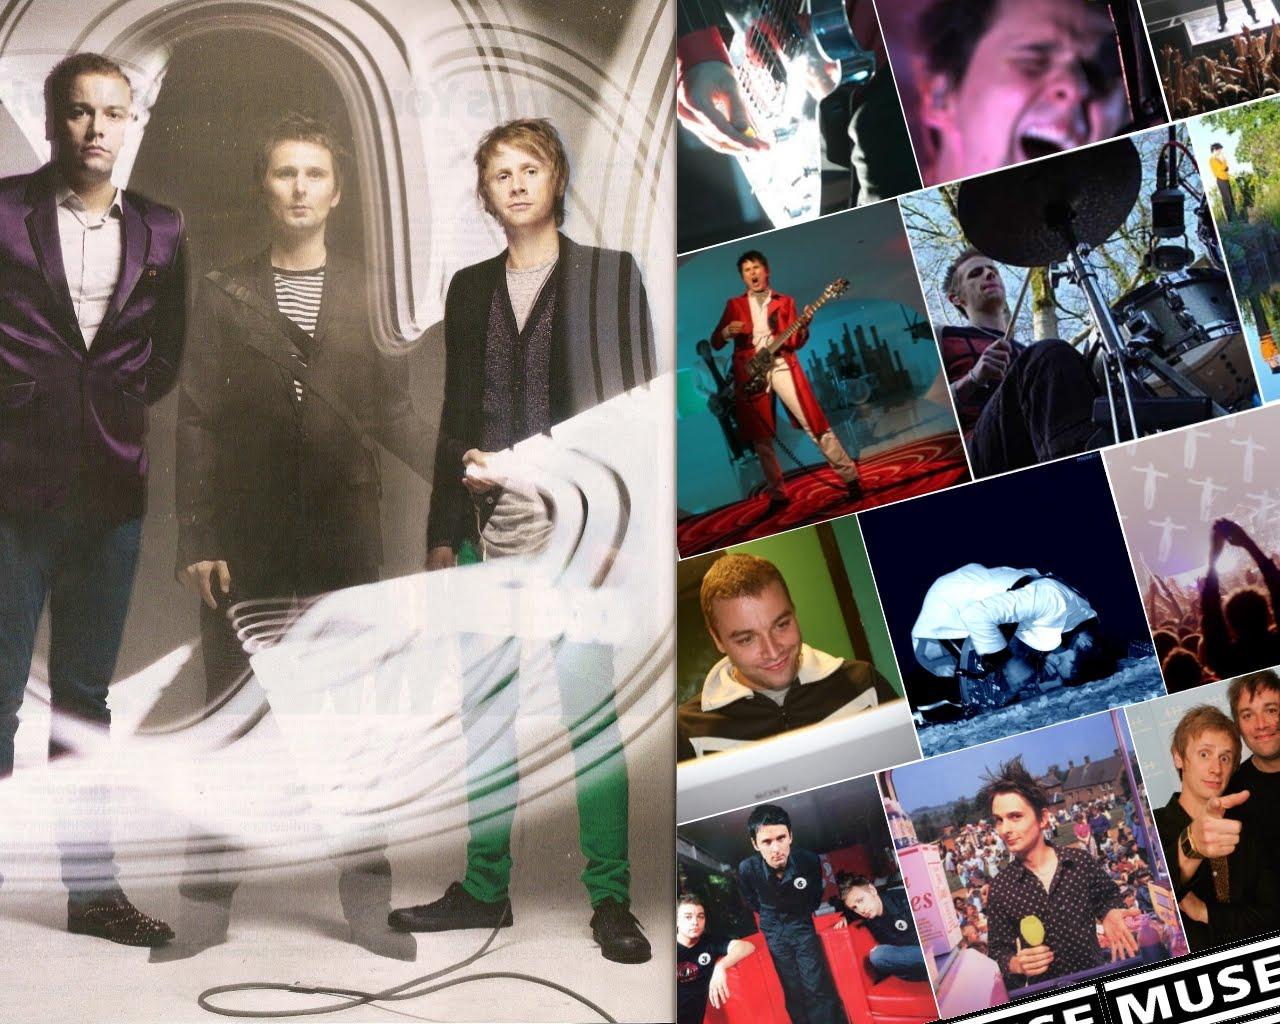 http://3.bp.blogspot.com/-B_G8NtDBfCo/TrDJ_tYa3MI/AAAAAAAAFEs/EVjiCt7RFus/s1600/muse-wallpaper-10.jpg